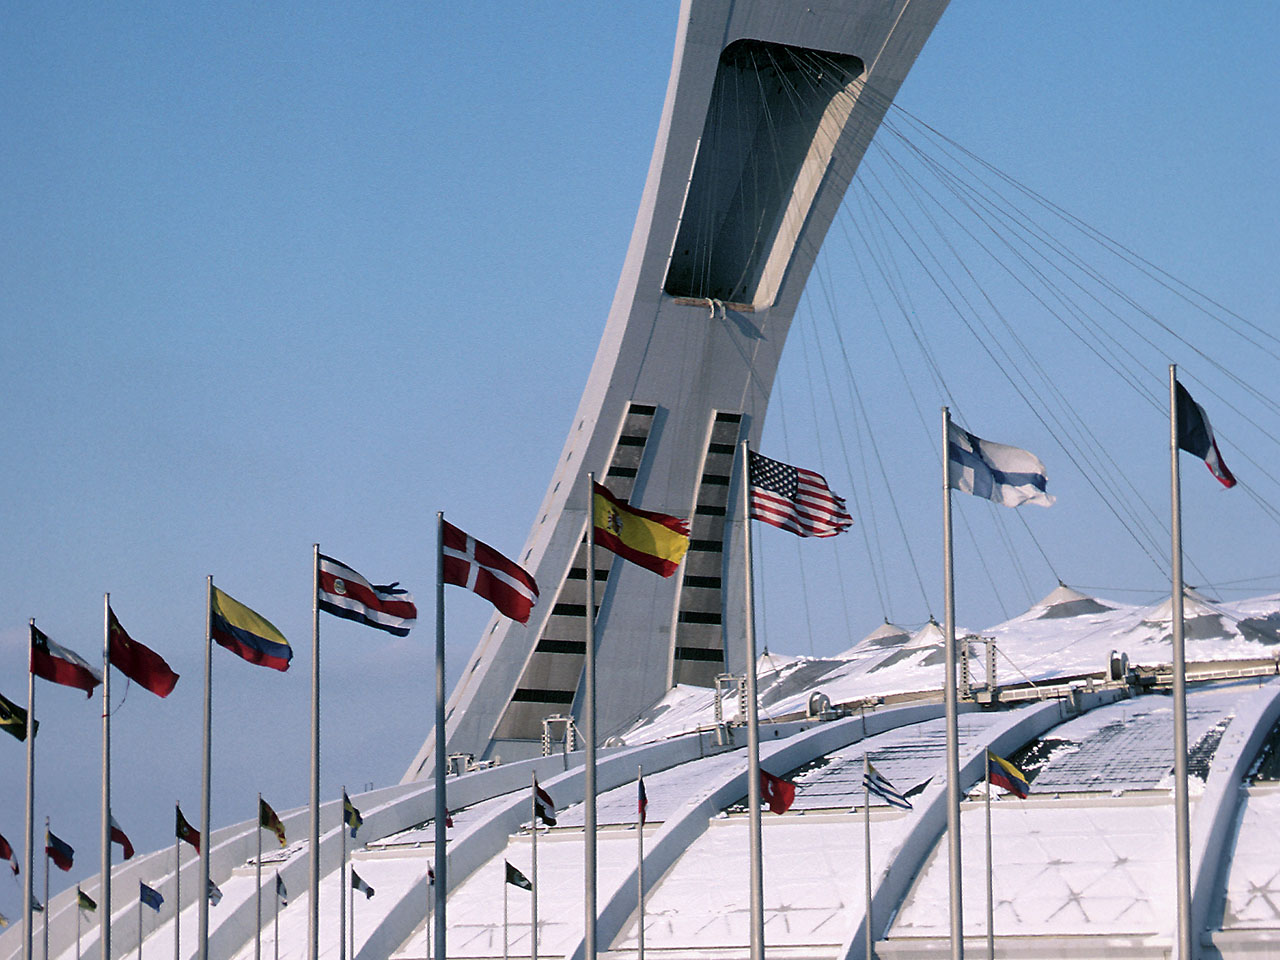 Jeux olympiques : que deviennent les installations sportives ?